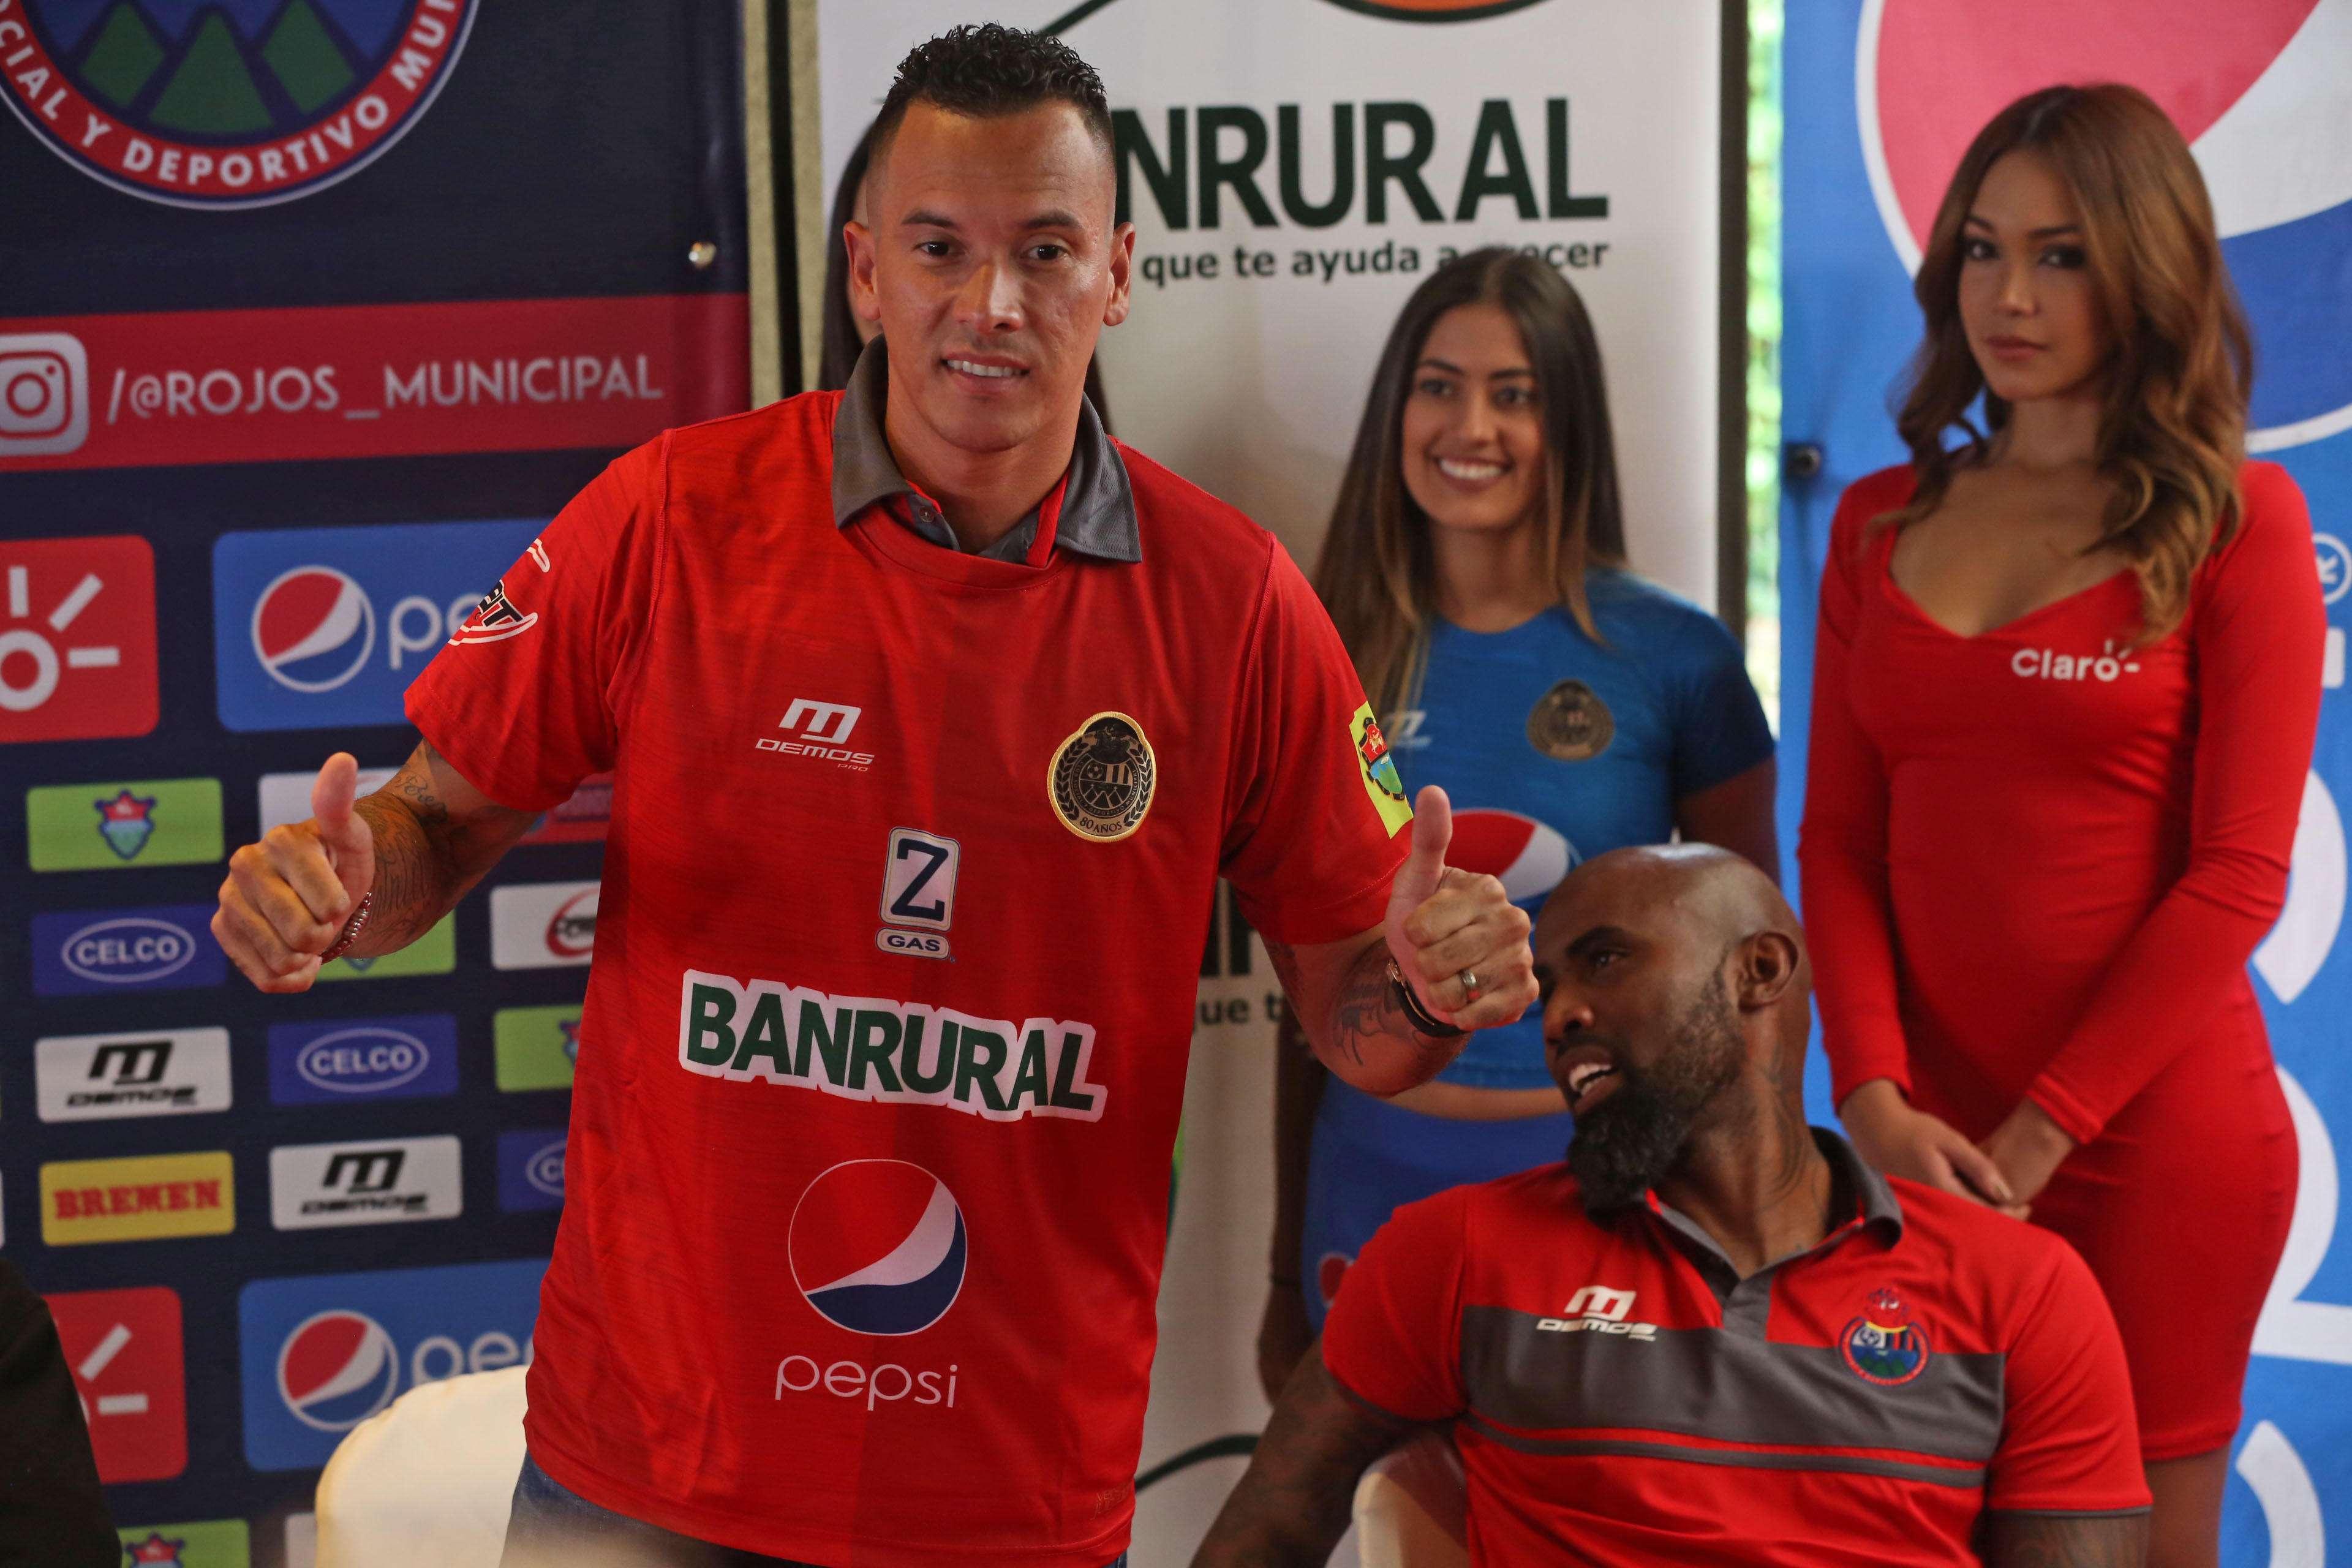 Blas Pérez (izq.) posa con su camiseta del Municipal. Foto: EFE